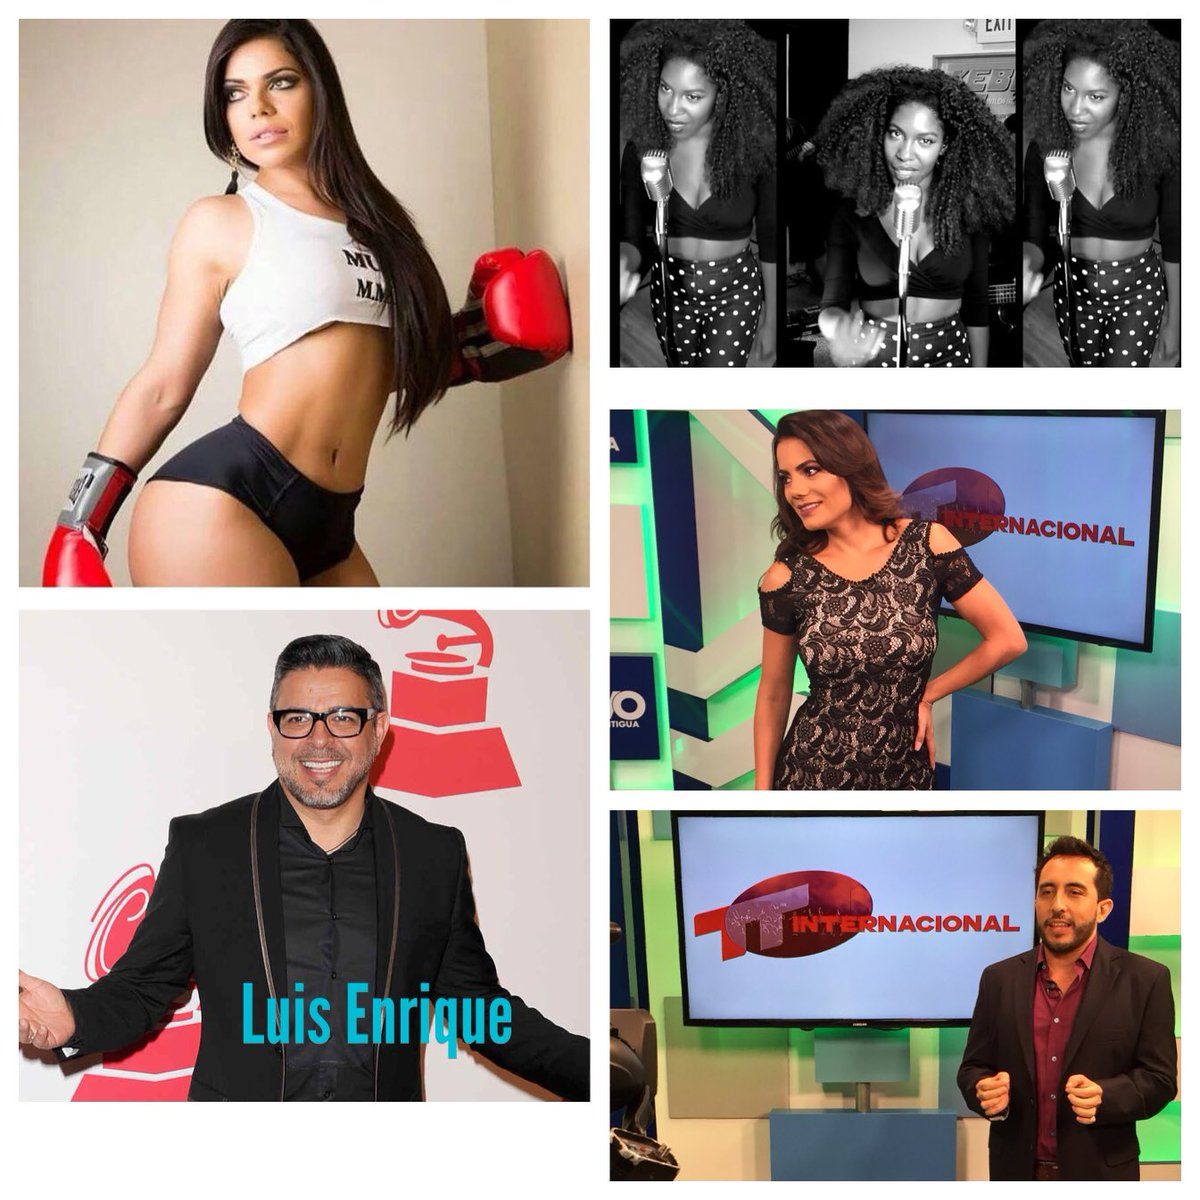 RT @ttguatemala: Hoy Lunes 5:00 P.M. Por @CanalAntigua tendremos a Suzy Cortez Miss Bumbum 2016, @LuisEnrique y la cantante Keba! https://t…